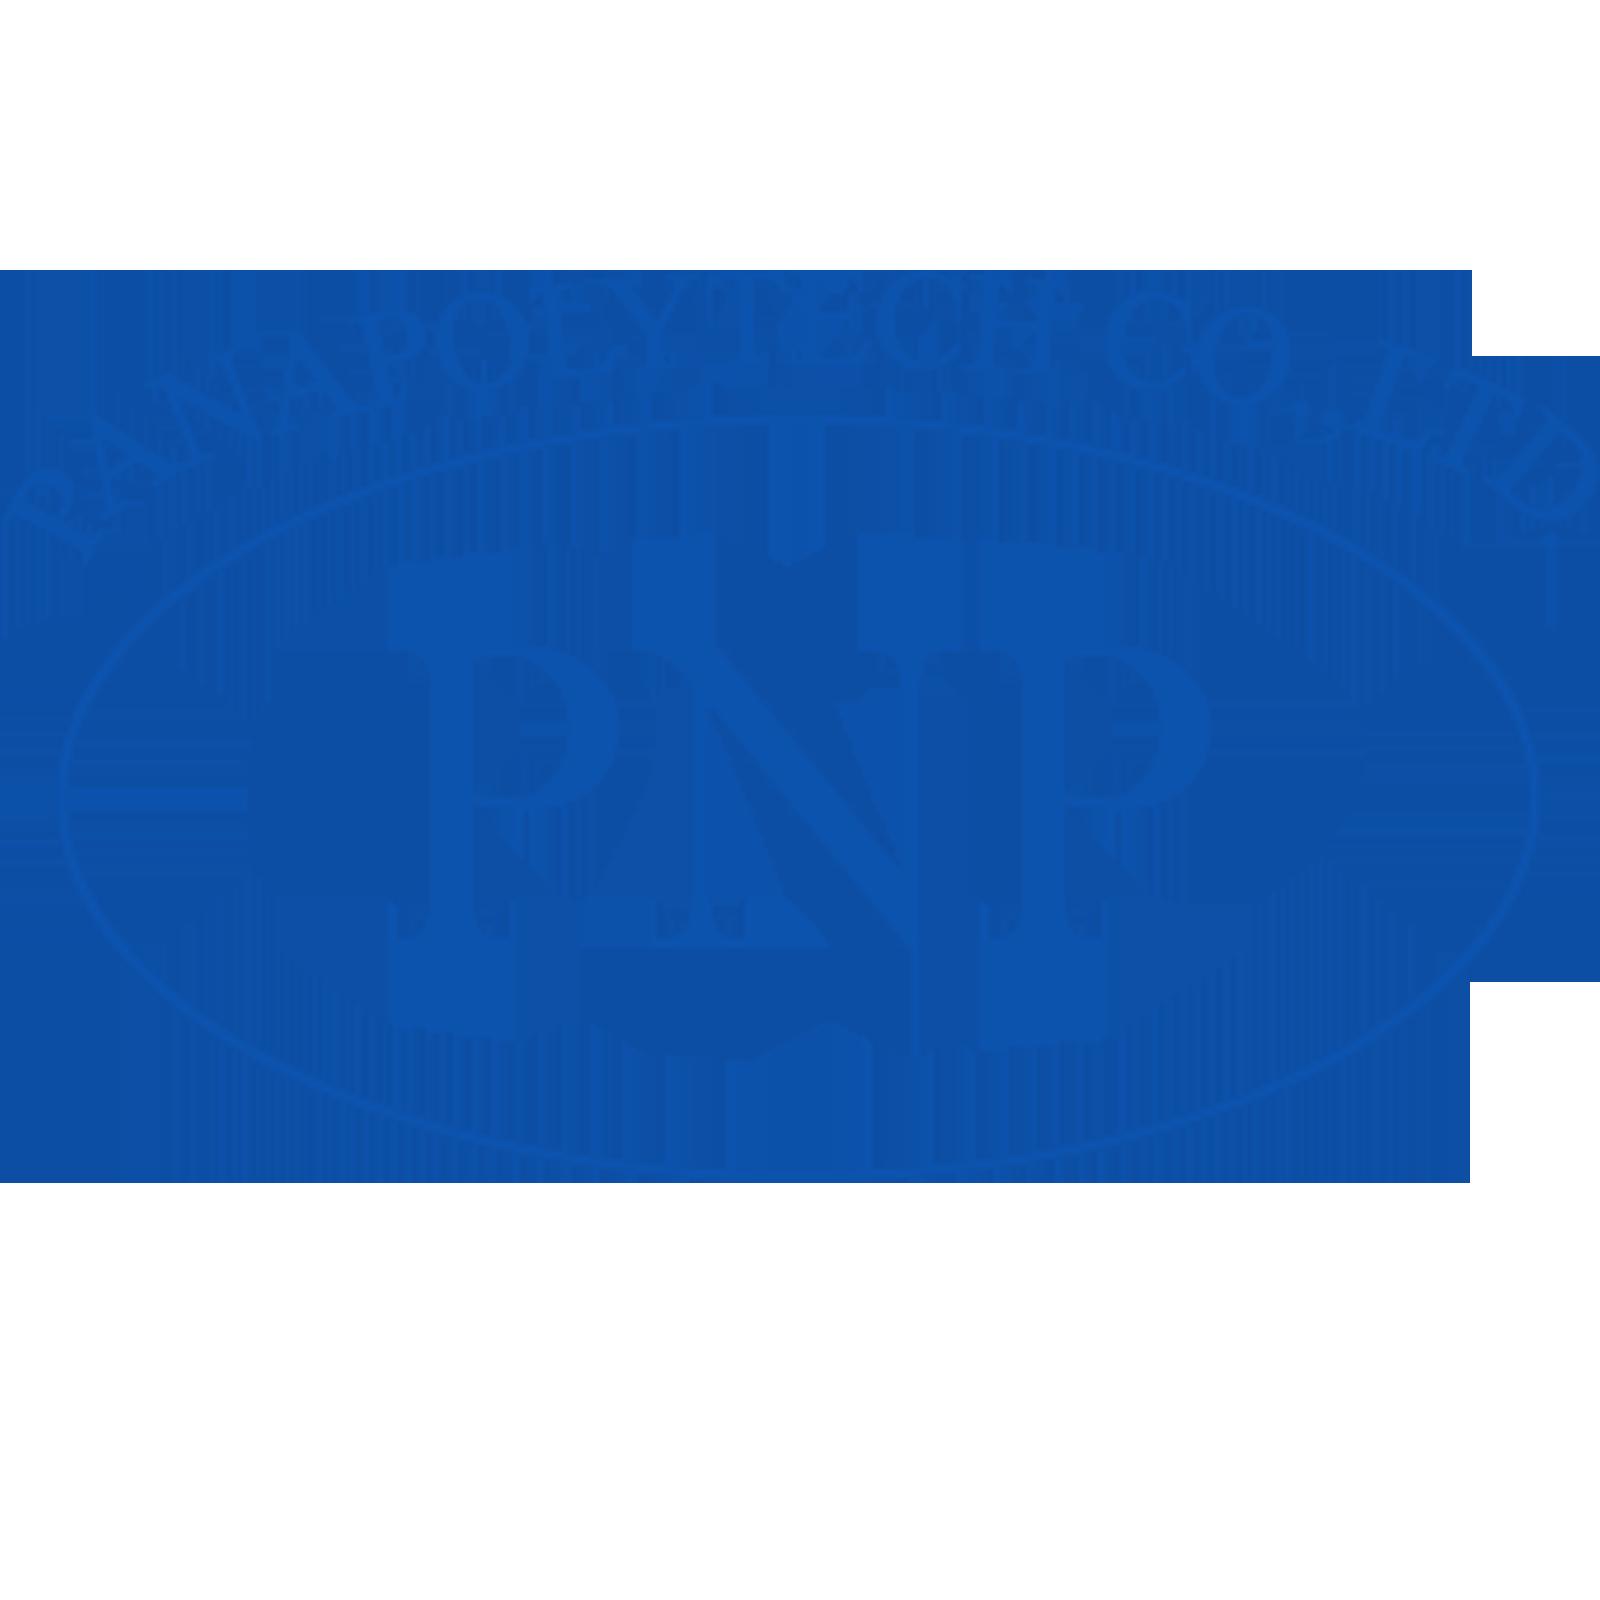 PANAPOLYTECH Co., LTD